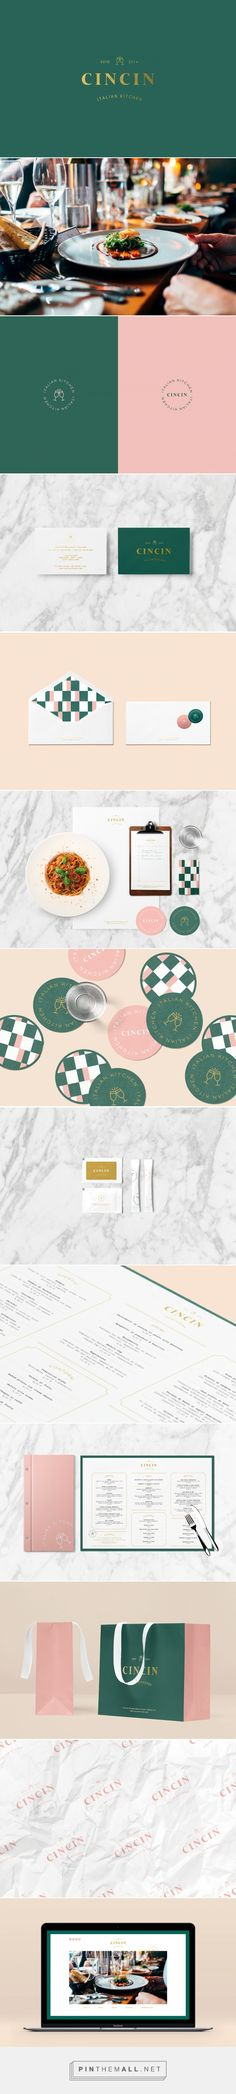 CINCIN Italian Kitchen Restaurant Branding by Xianwen Wei | Fivestar Branding Agency – Design and Branding Agency & Curated Inspiration Gallery